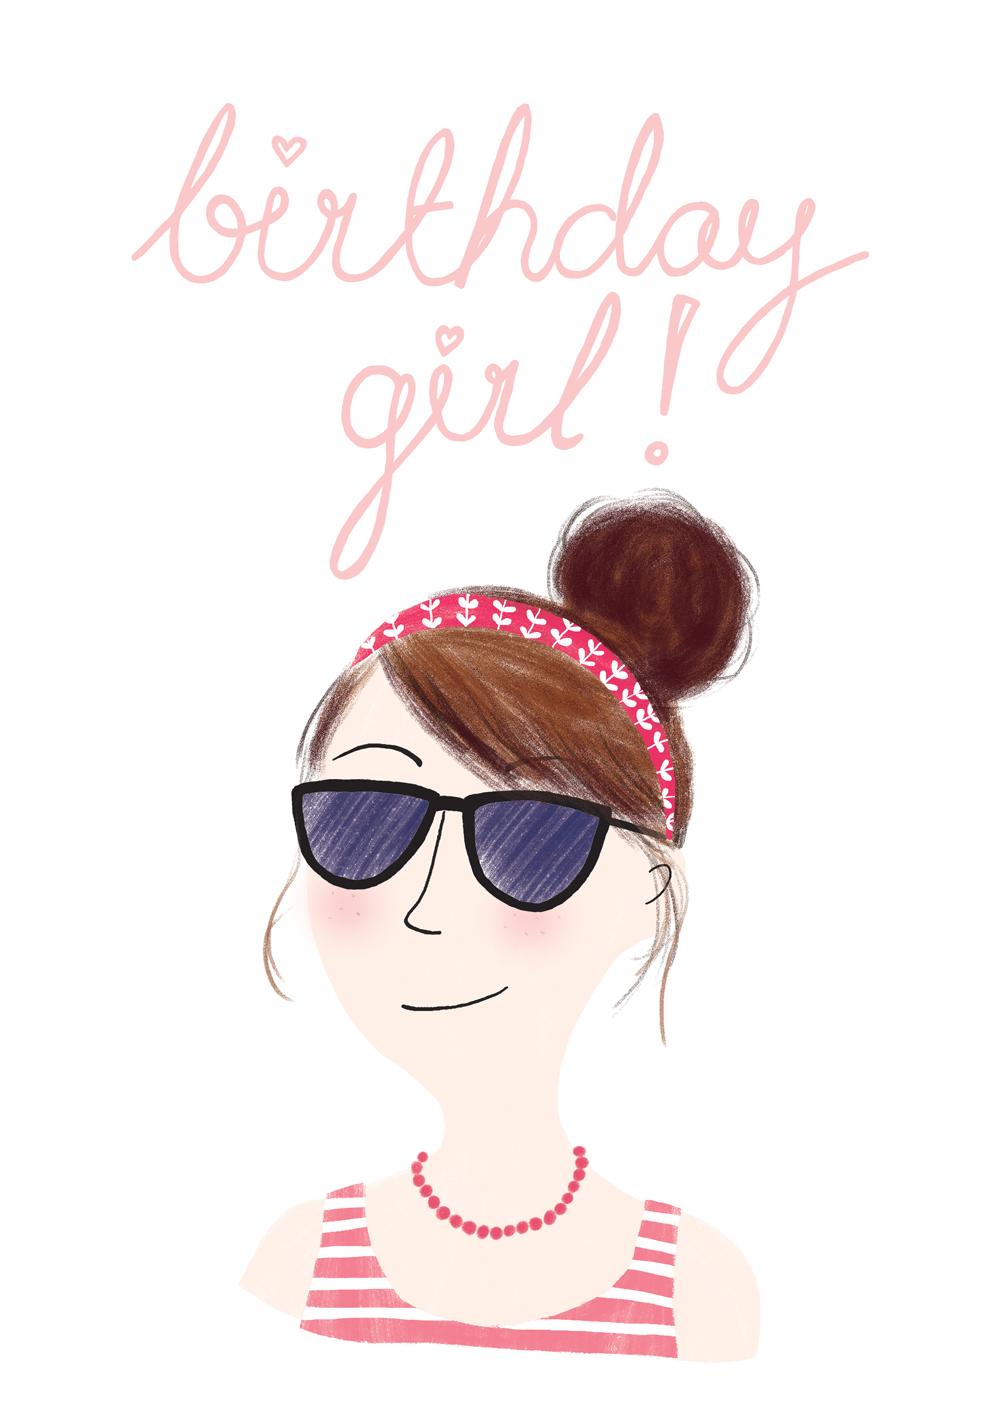 birthdaygirl_FINAL.png